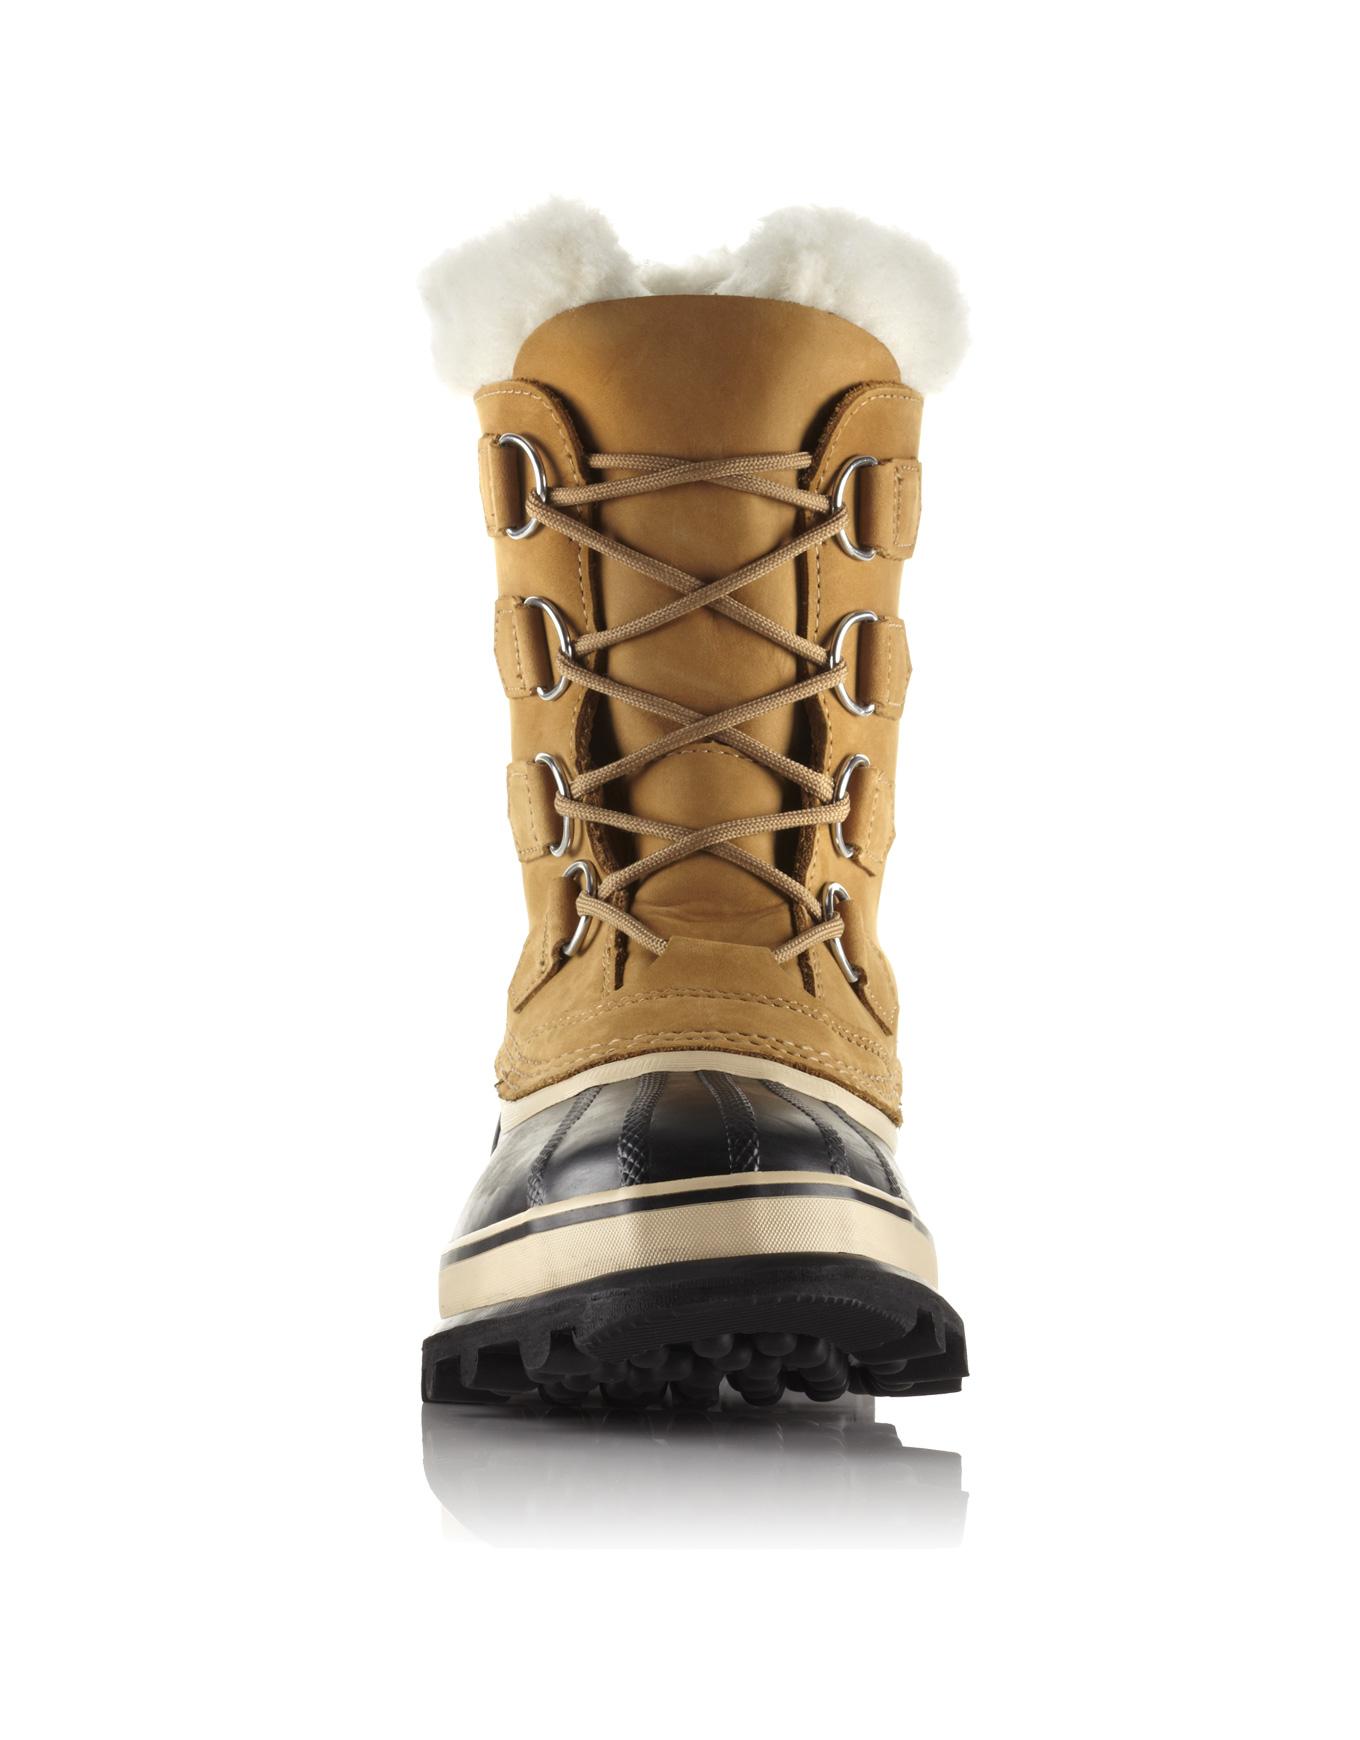 Sorel Homme Caribou Bottes d/'hiver 9 43 EU chamois